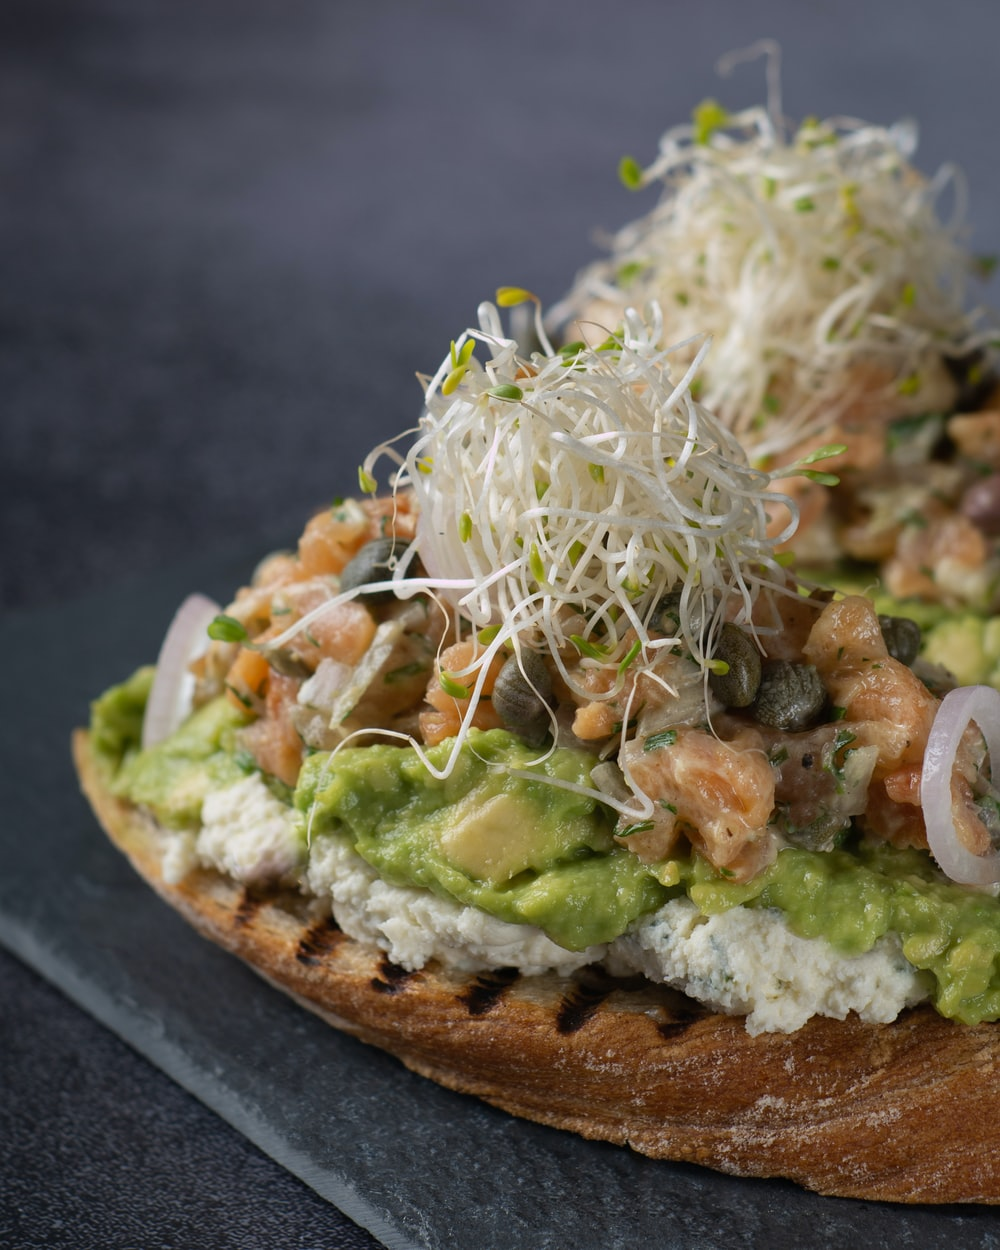 vegetable salad on brown bread